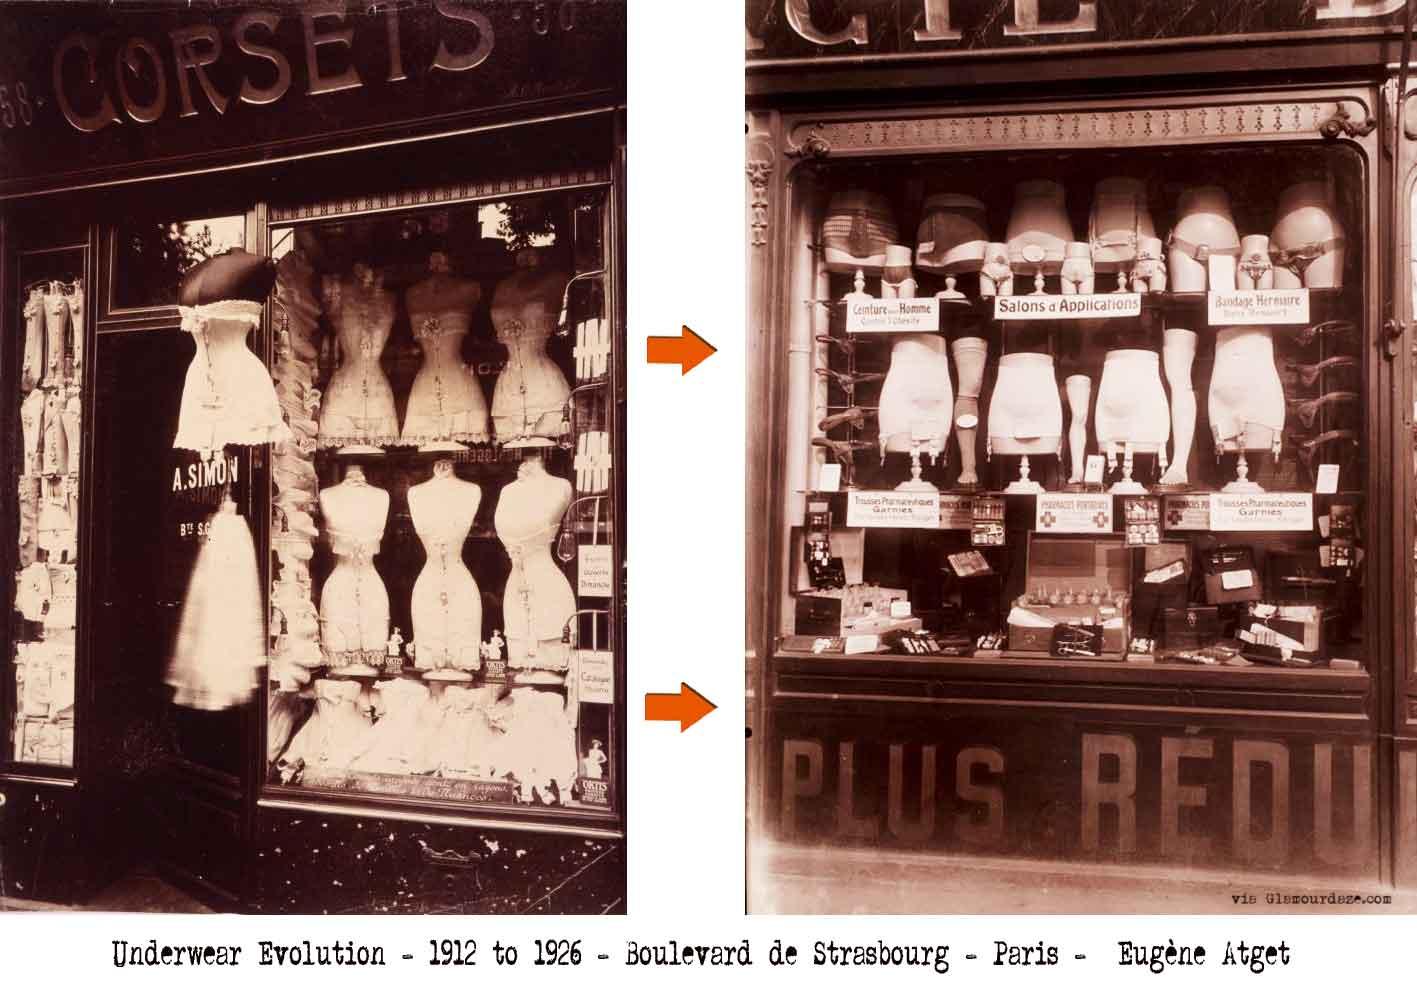 Two photographs of corset shops taken in the fashionable Boulevard de